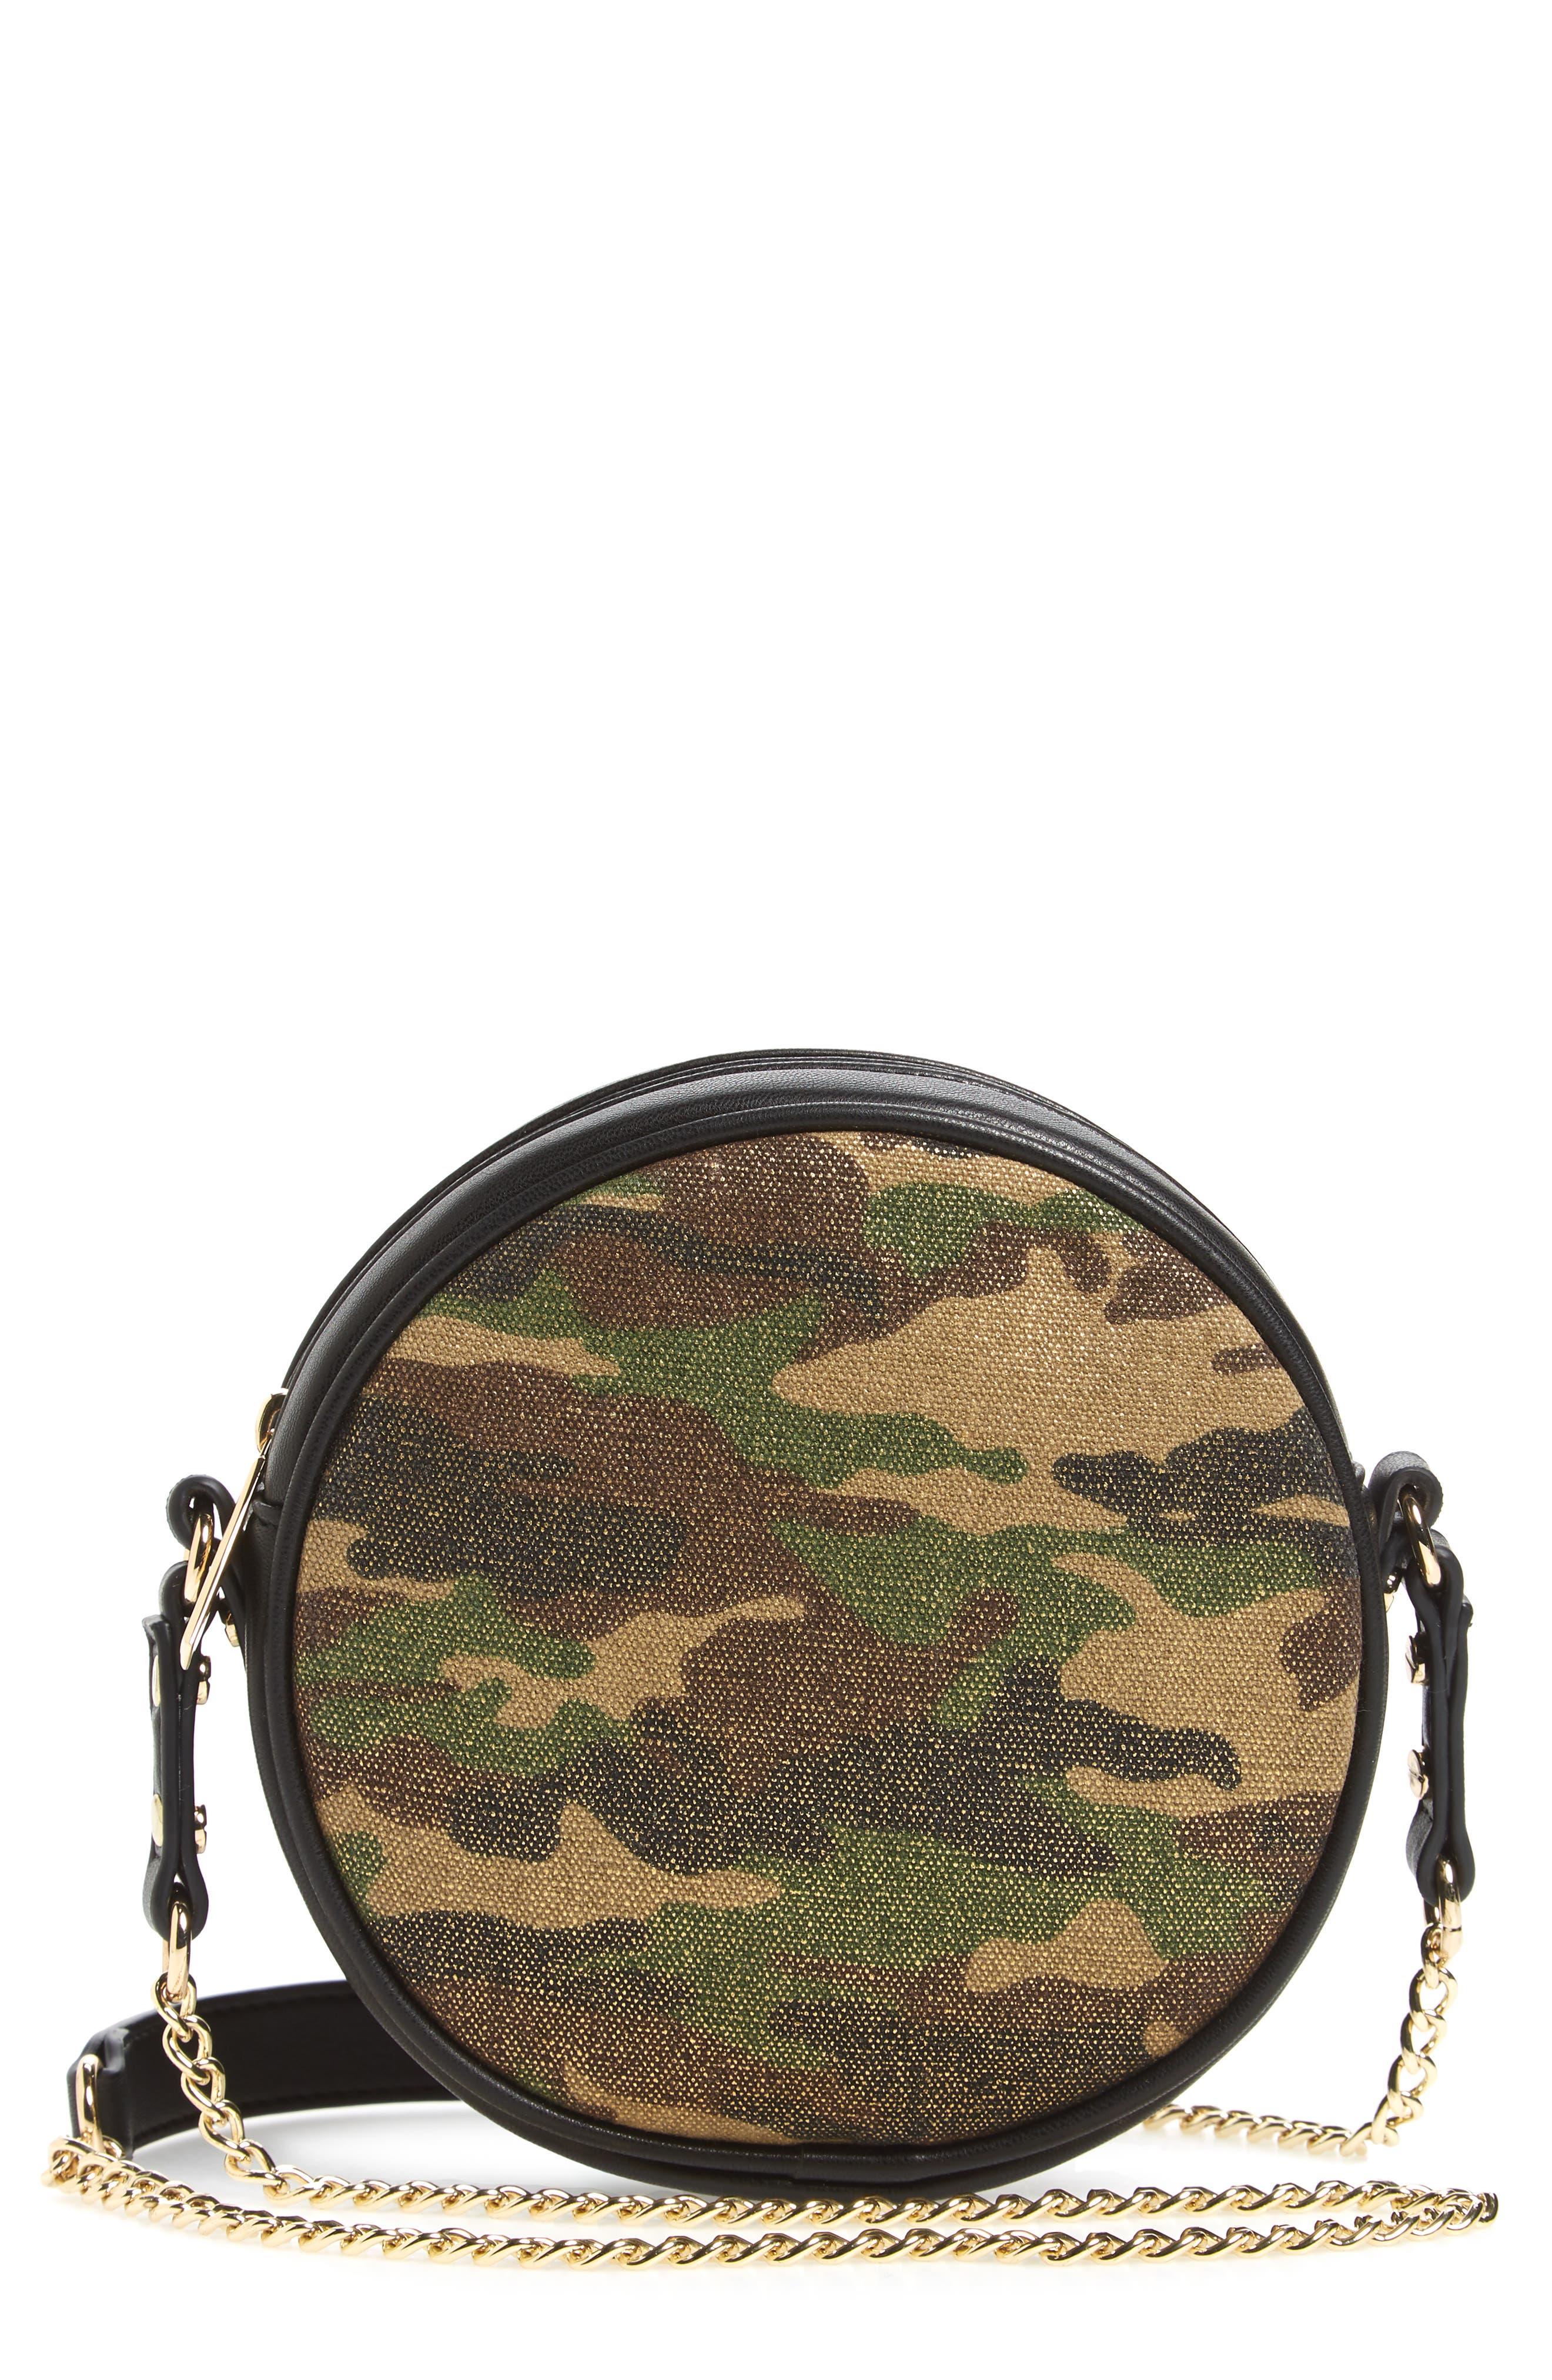 Mali + Lili Camouflage Vegan Leather Canteen Crossbody Bag